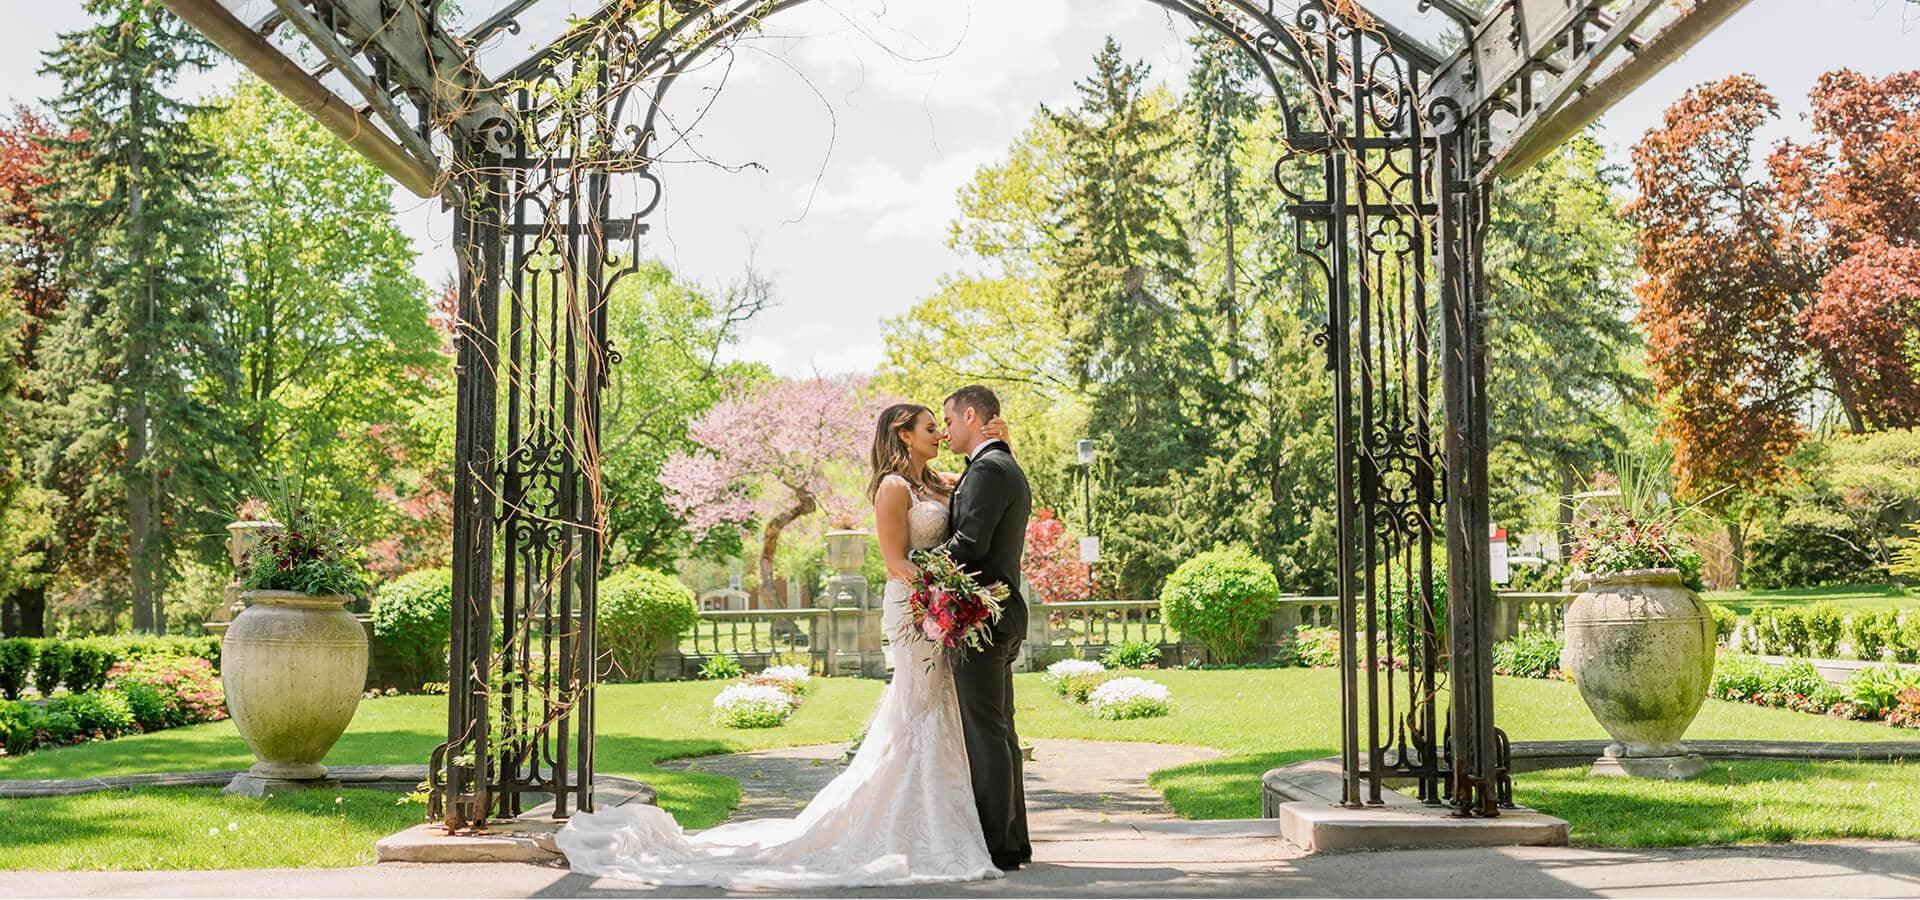 Hero image for Lauren & Michael's Elegant Fairy Tale Wedding at Grand Luxe